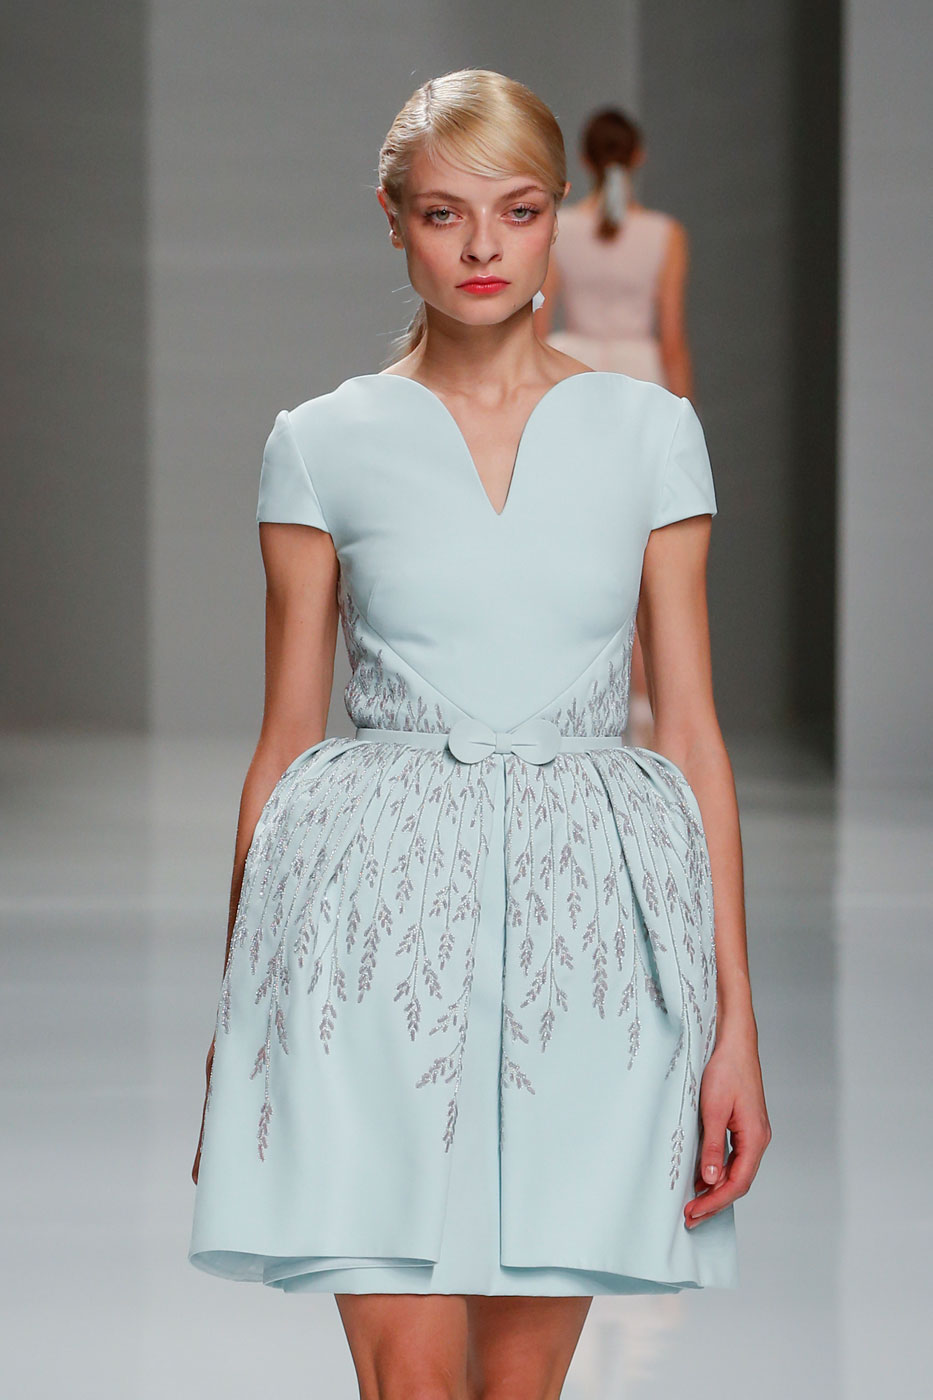 Georges-Hobeika-fashion-runway-show-haute-couture-paris-spring-2015-the-impression-04